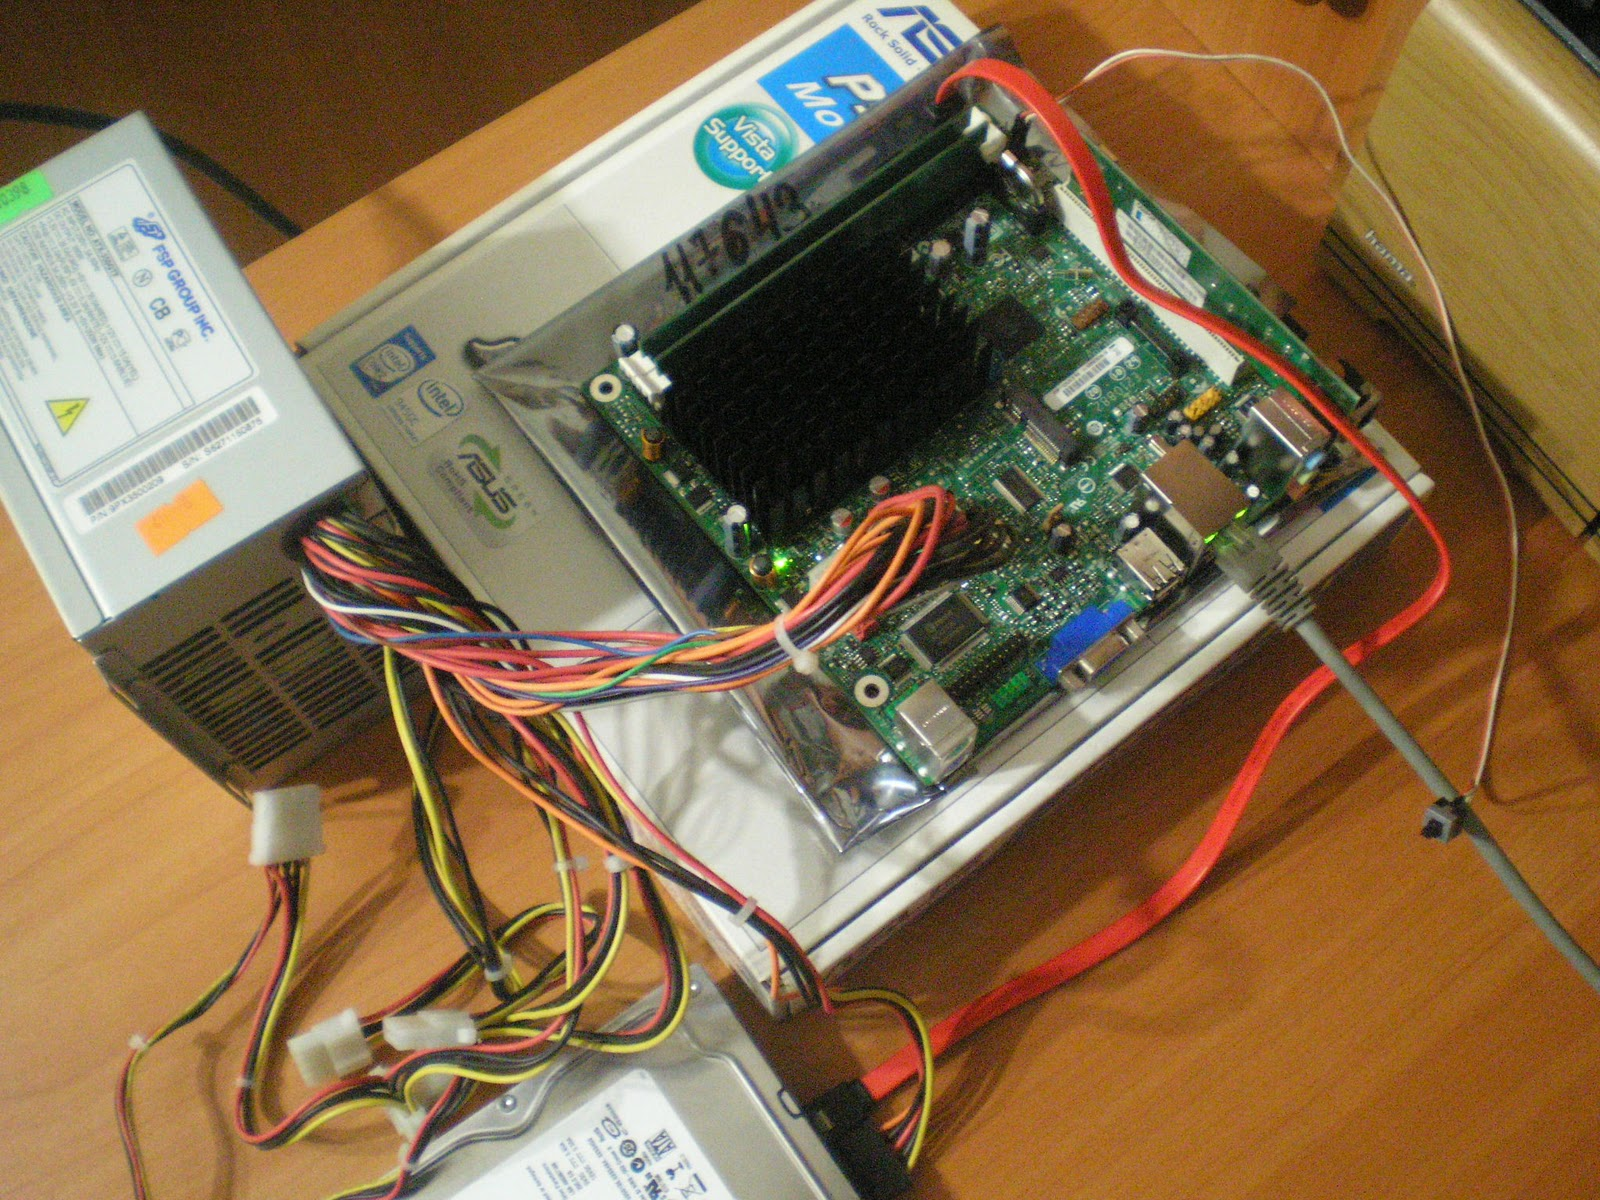 Домашний сервер своими руками 2016